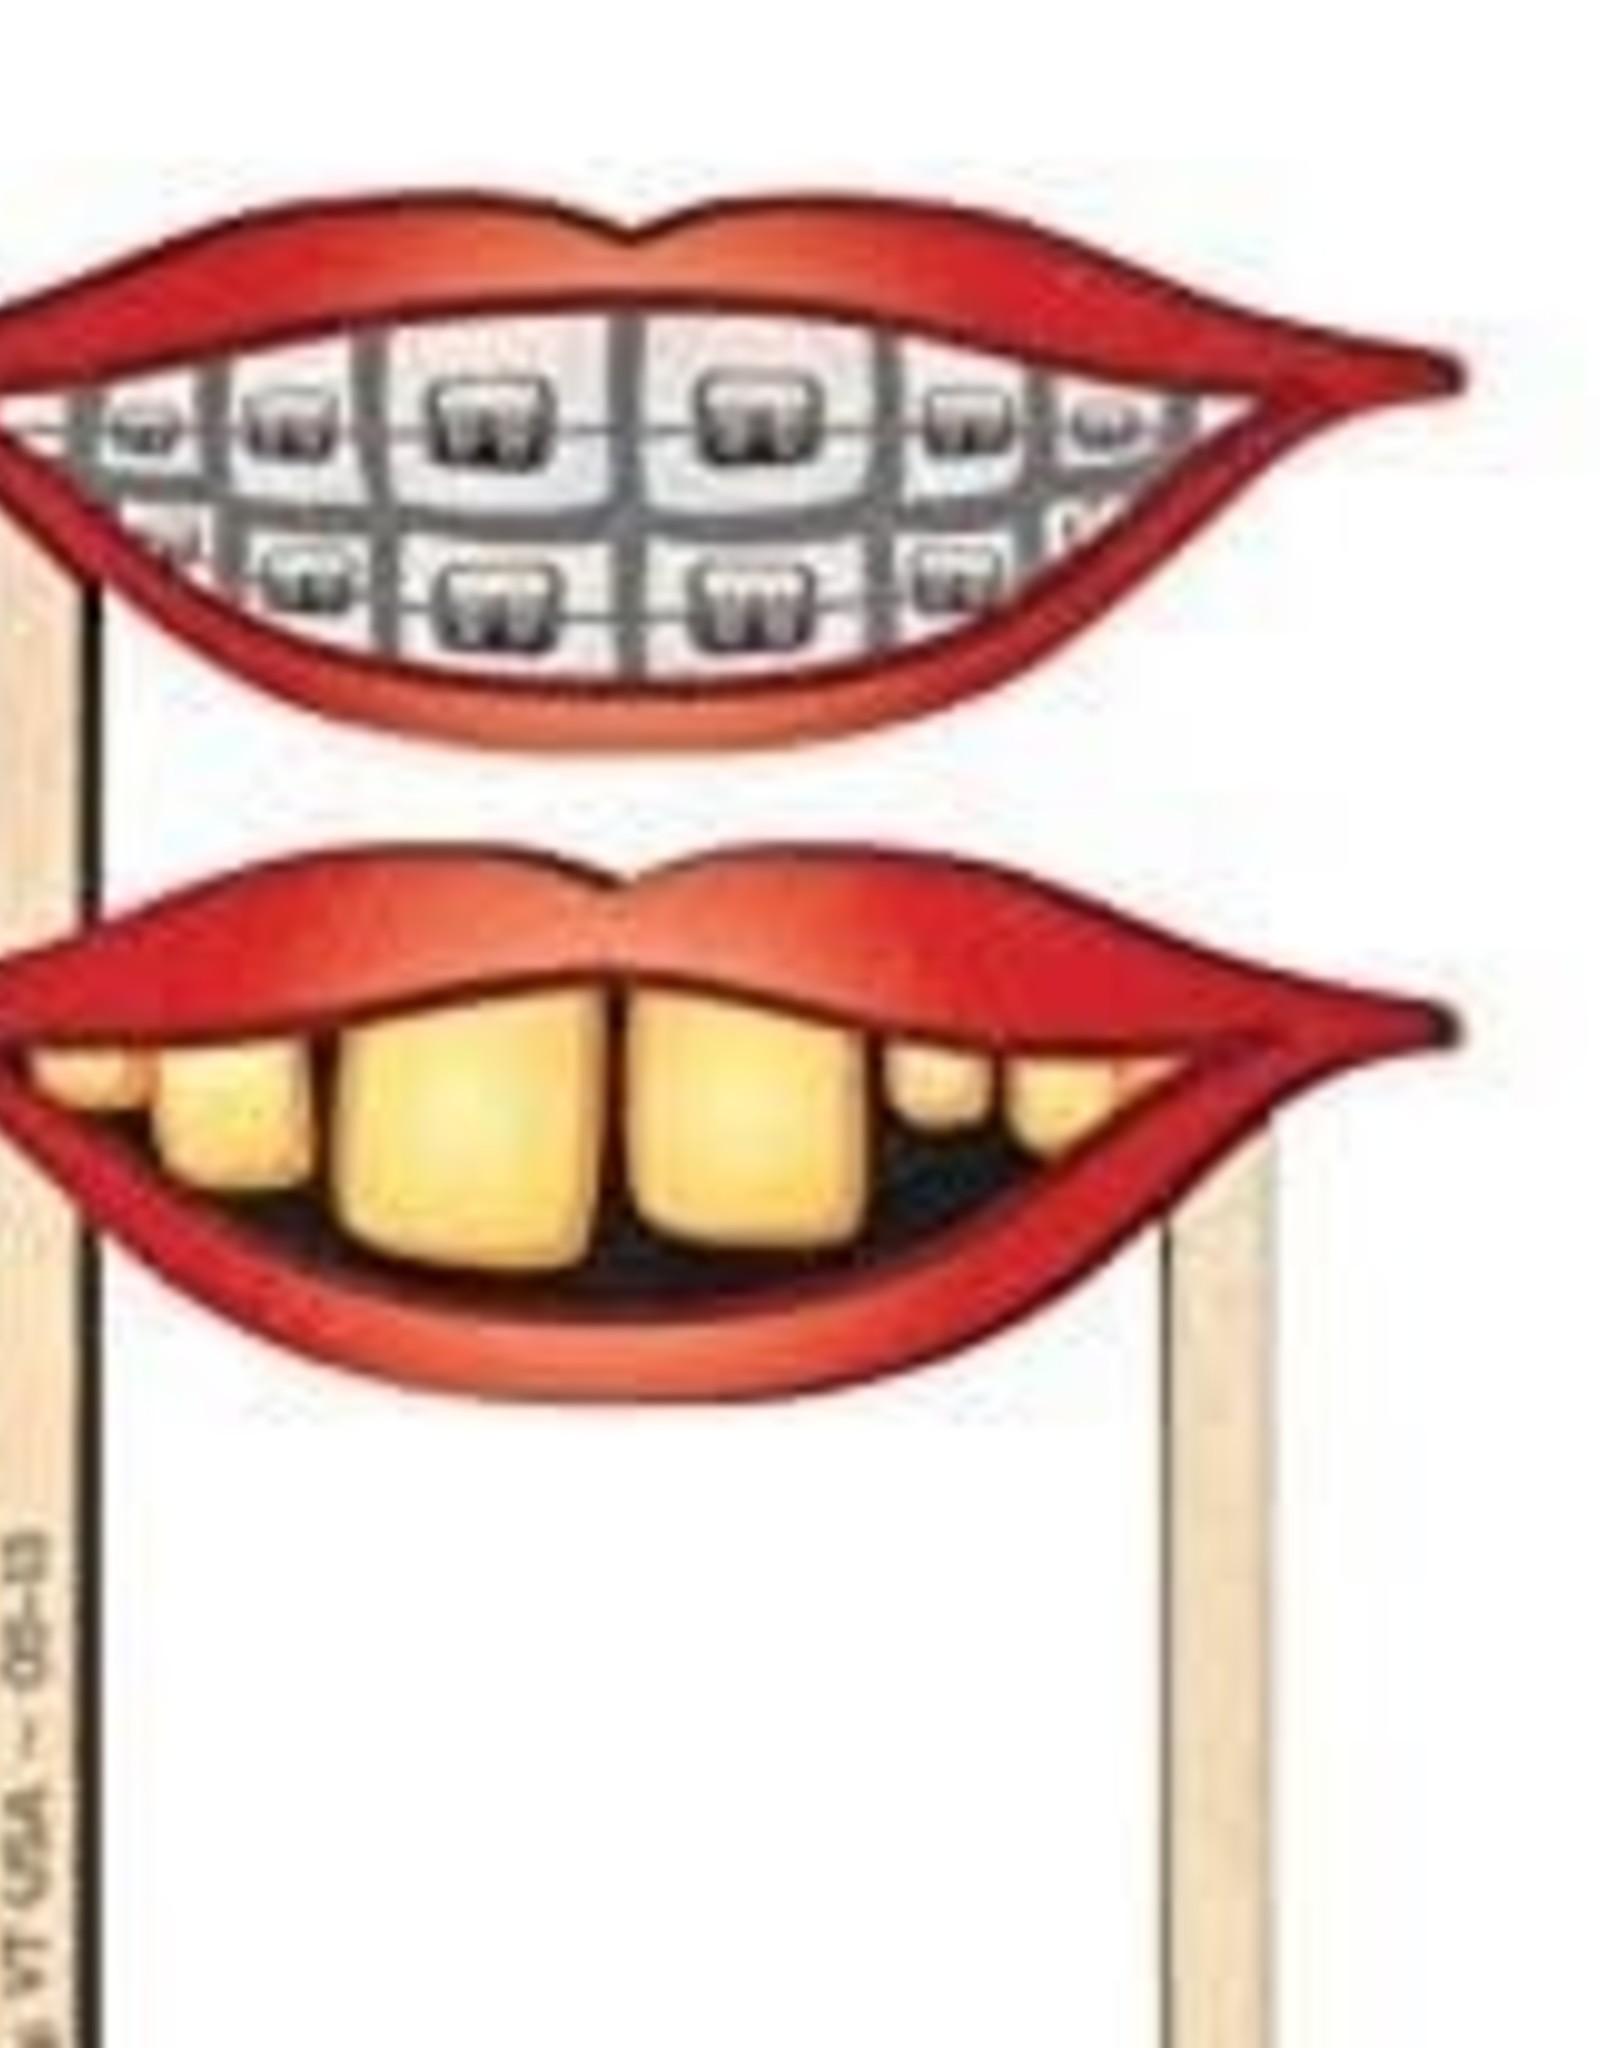 Maple Landmark Silly Sticks: Braces Teeth